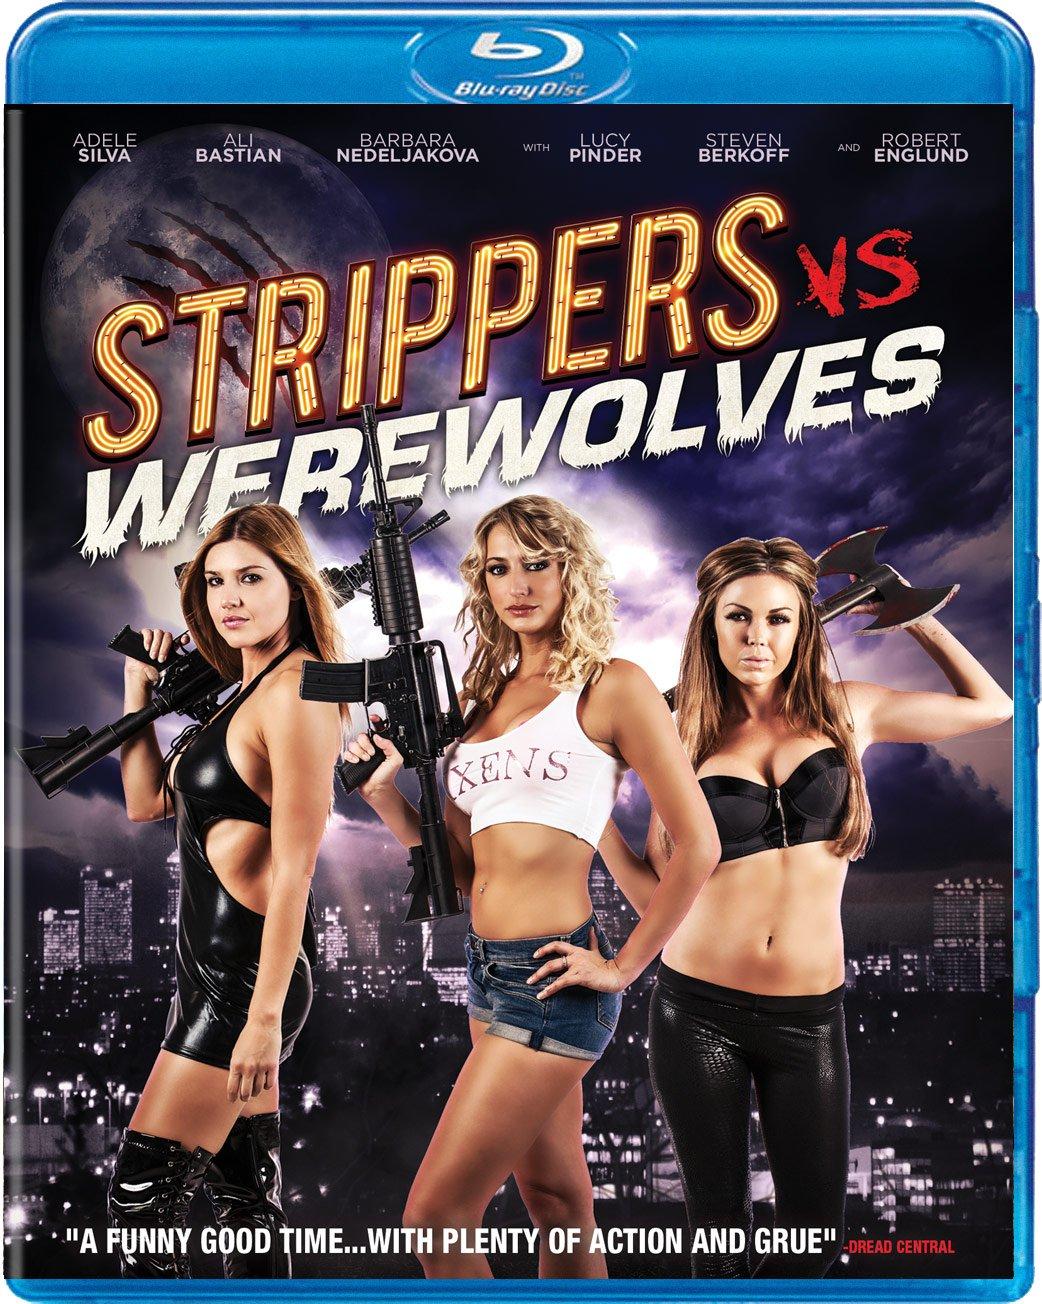 Strippers Vs Werewolves (Blu-ray)